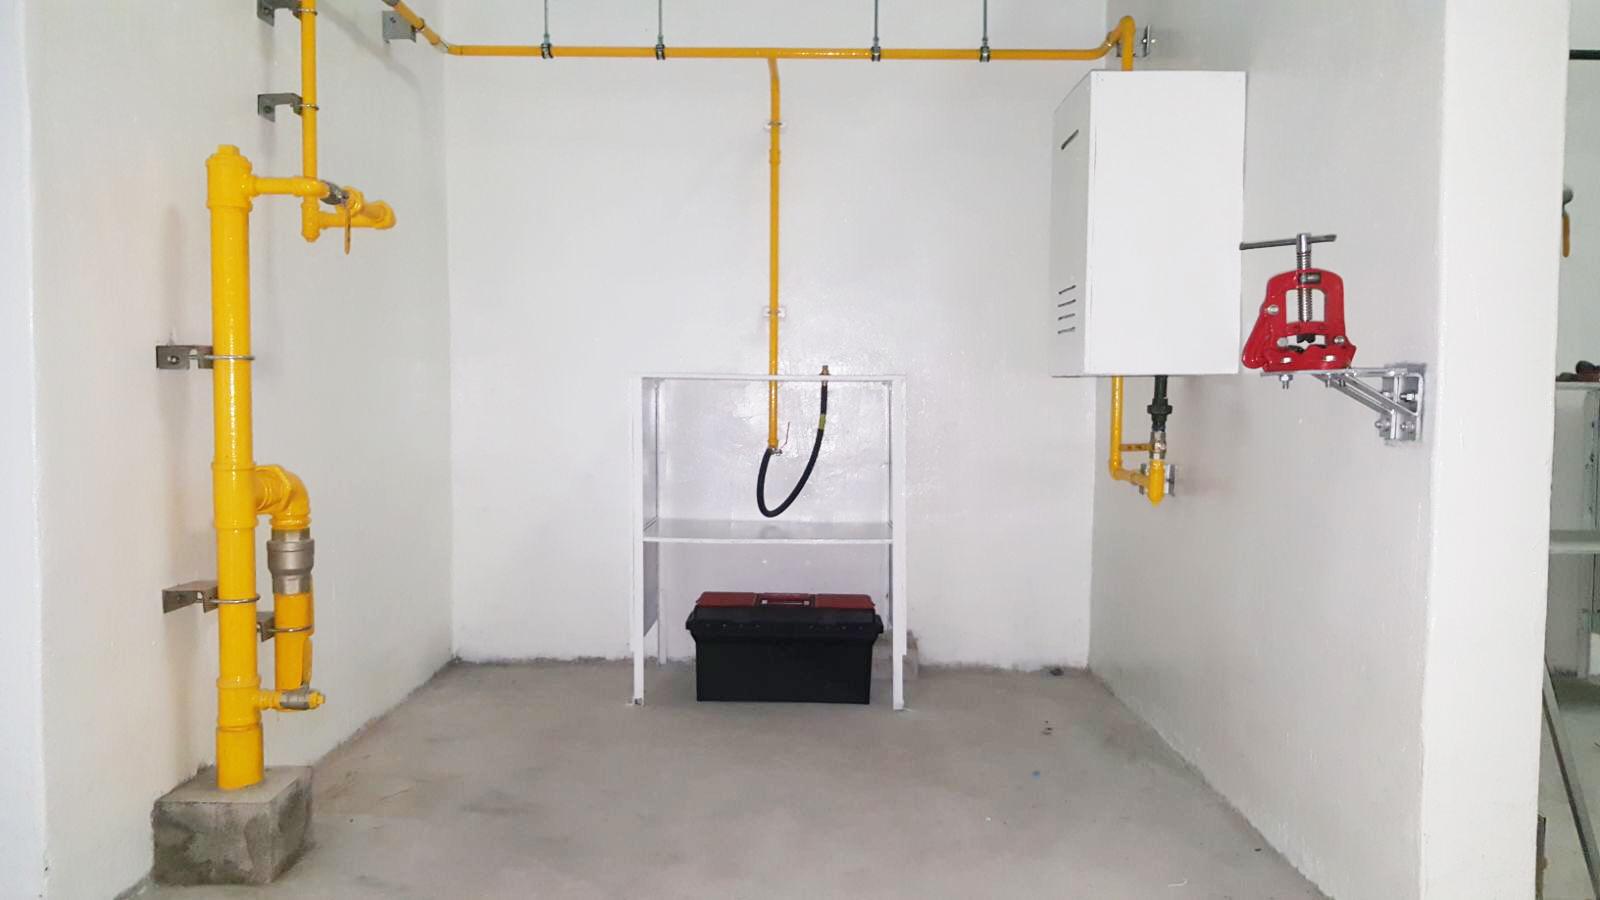 Training Facilities (Interior Gas Pipefittings)